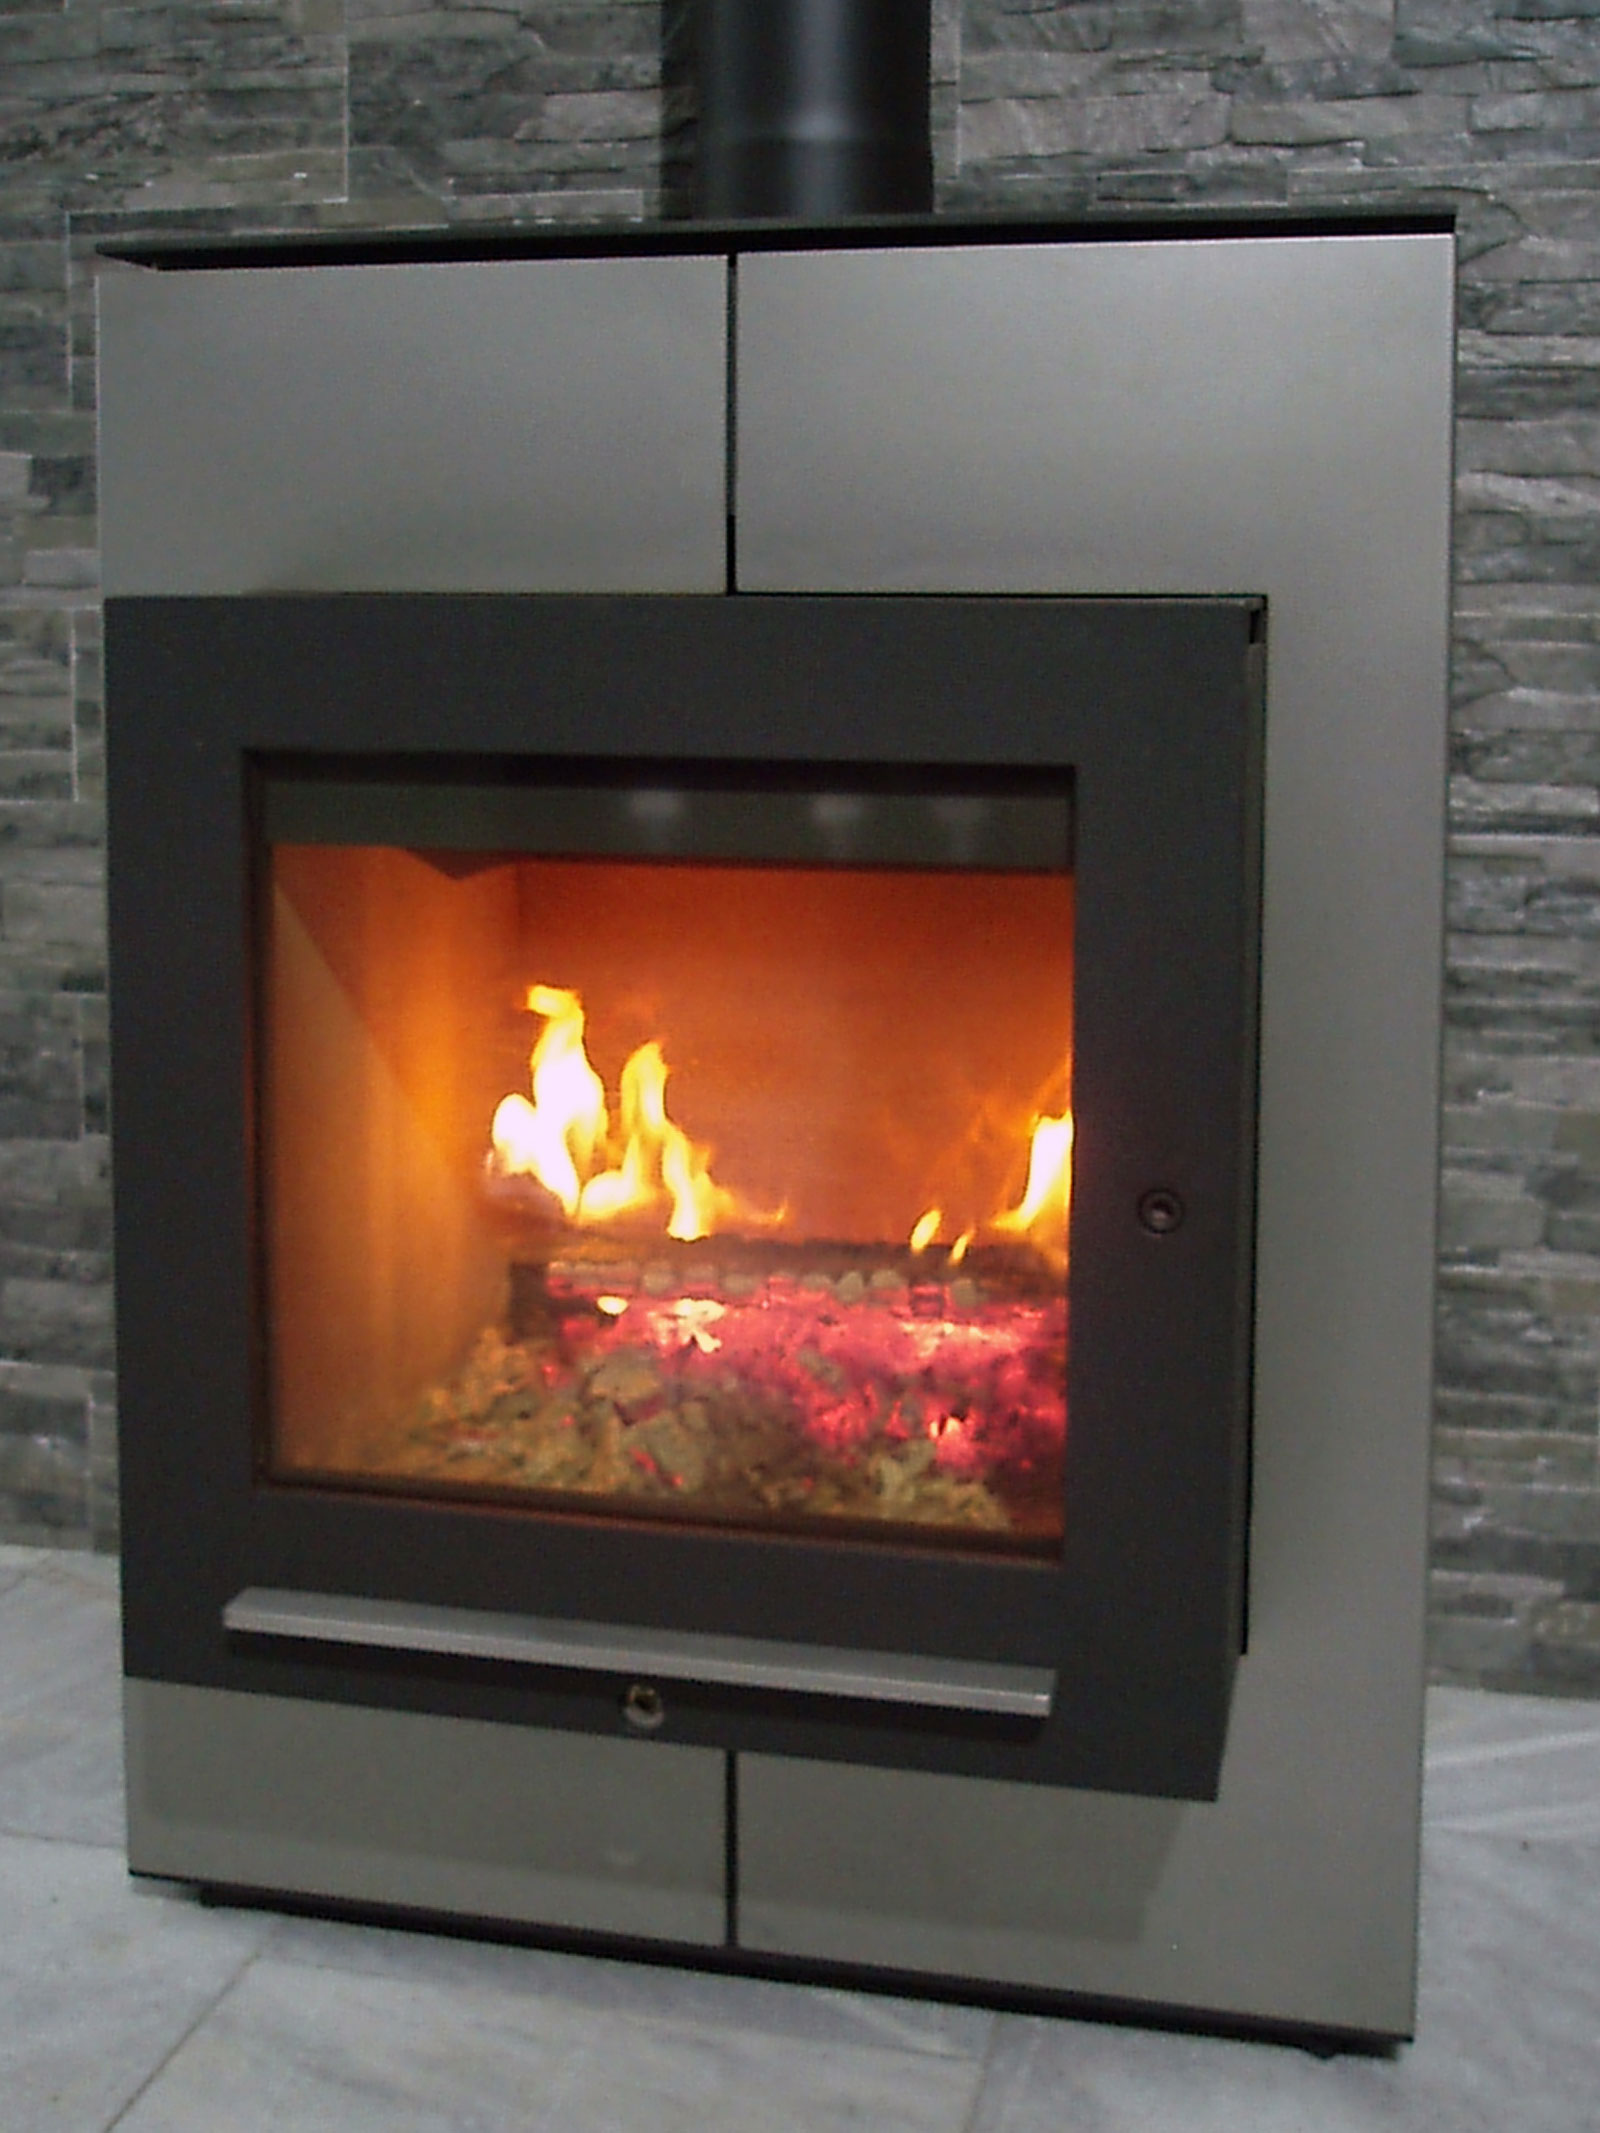 masavukmanovic.com - firecube fireplace 03